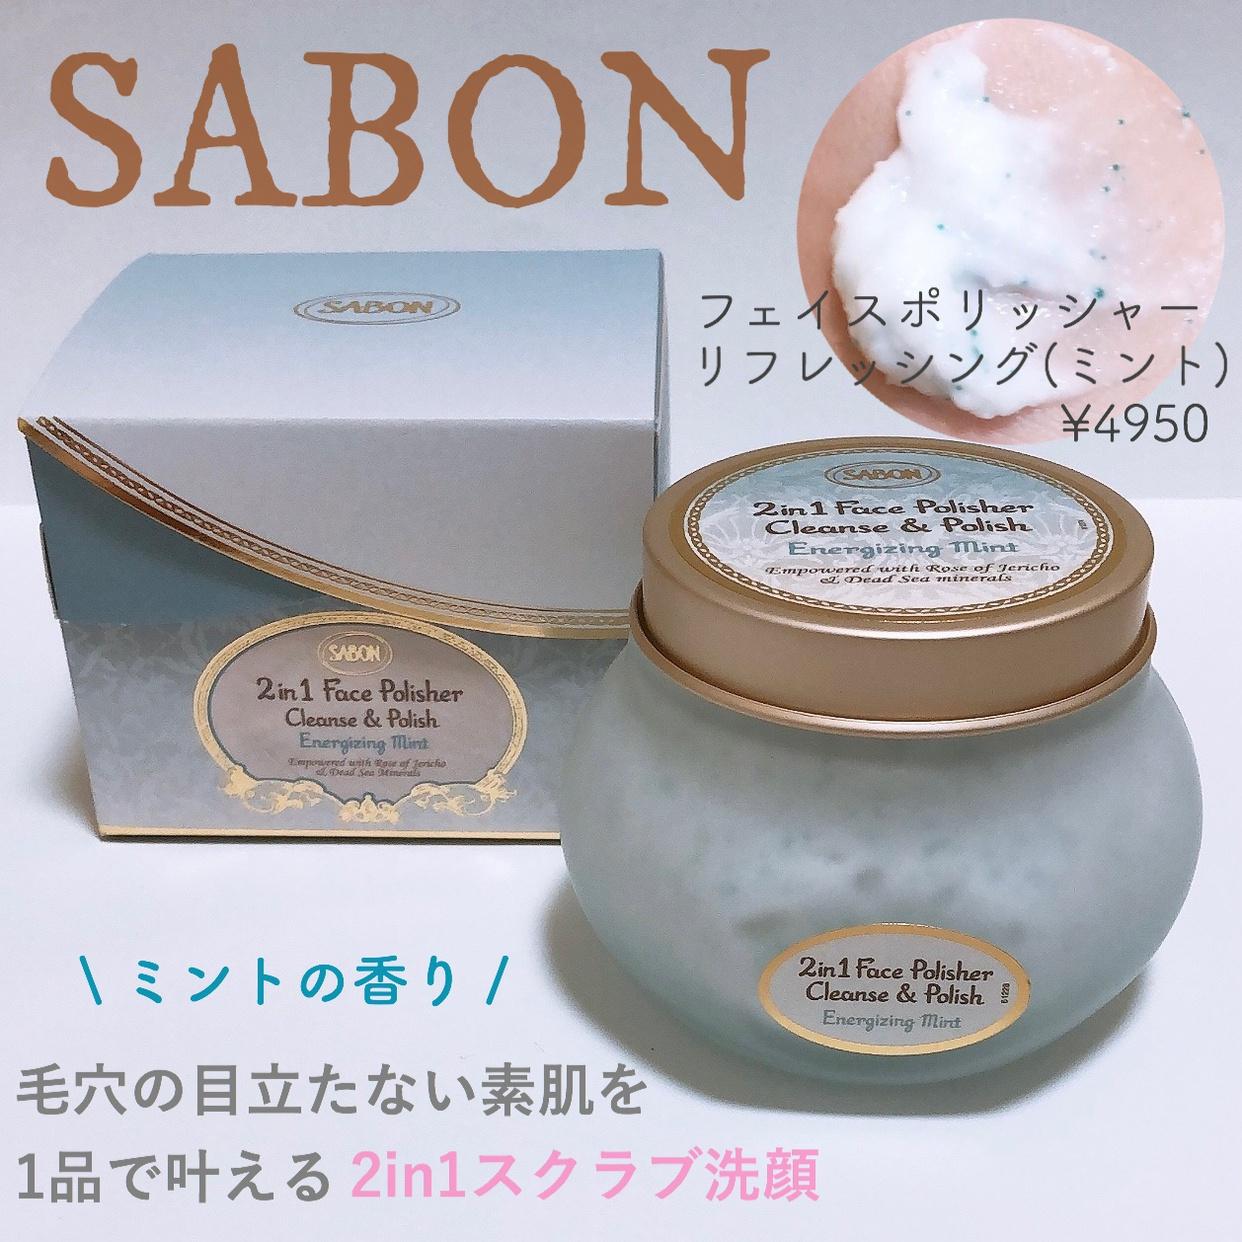 SABON(サボン) フェイスポリッシャー リフレッシングを使ったmiyu𓂃𓈒𓏸さんのクチコミ画像1